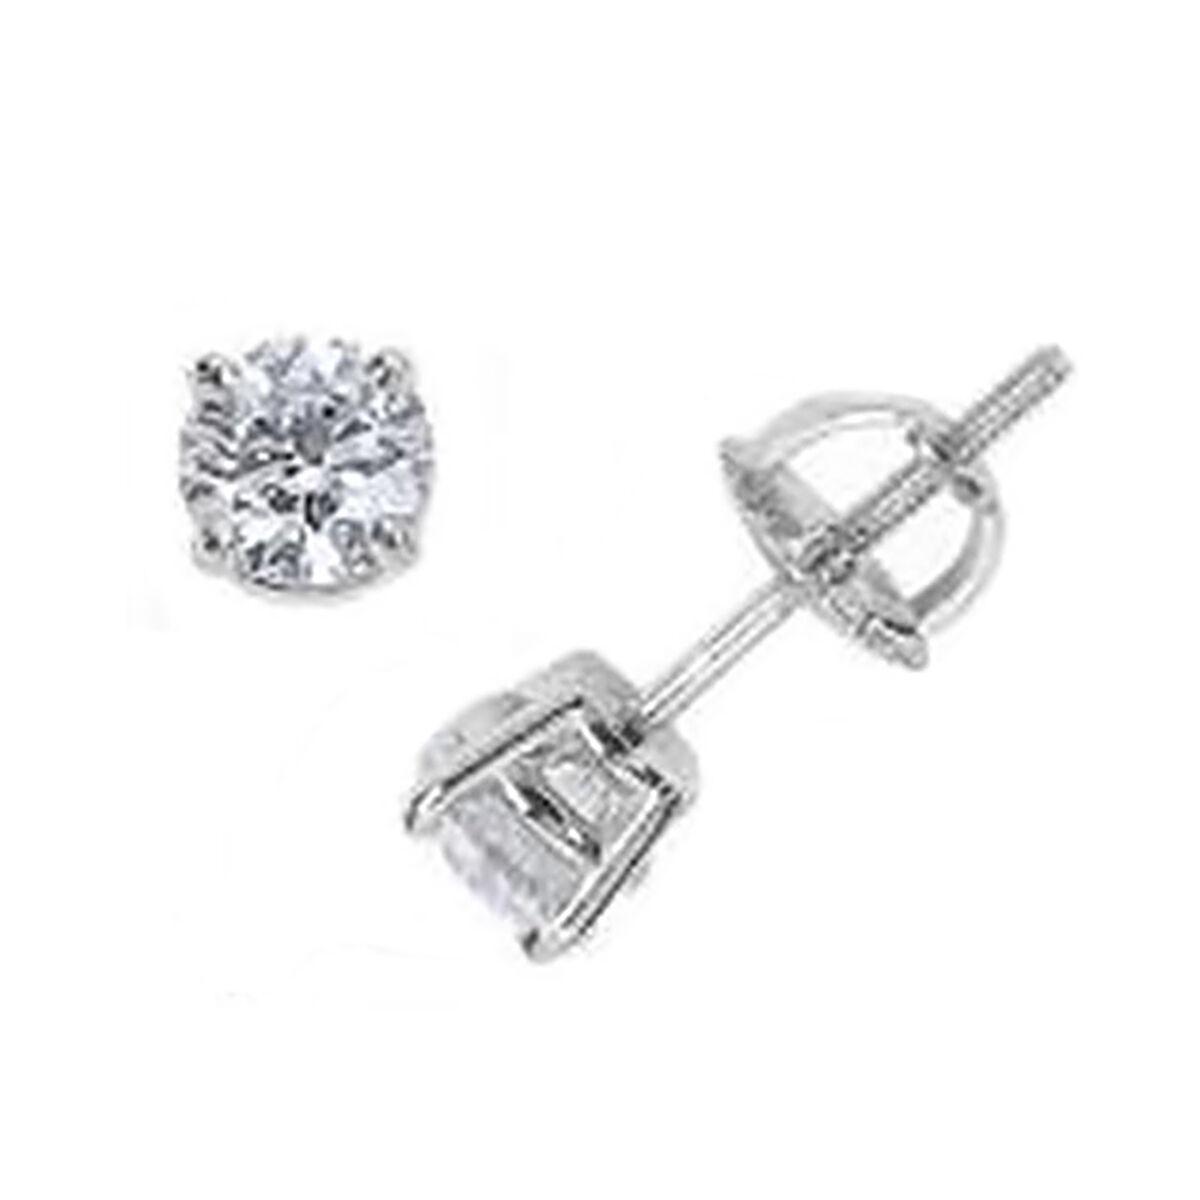 0.50 Ct Diamond Stud Solitaire Earrings